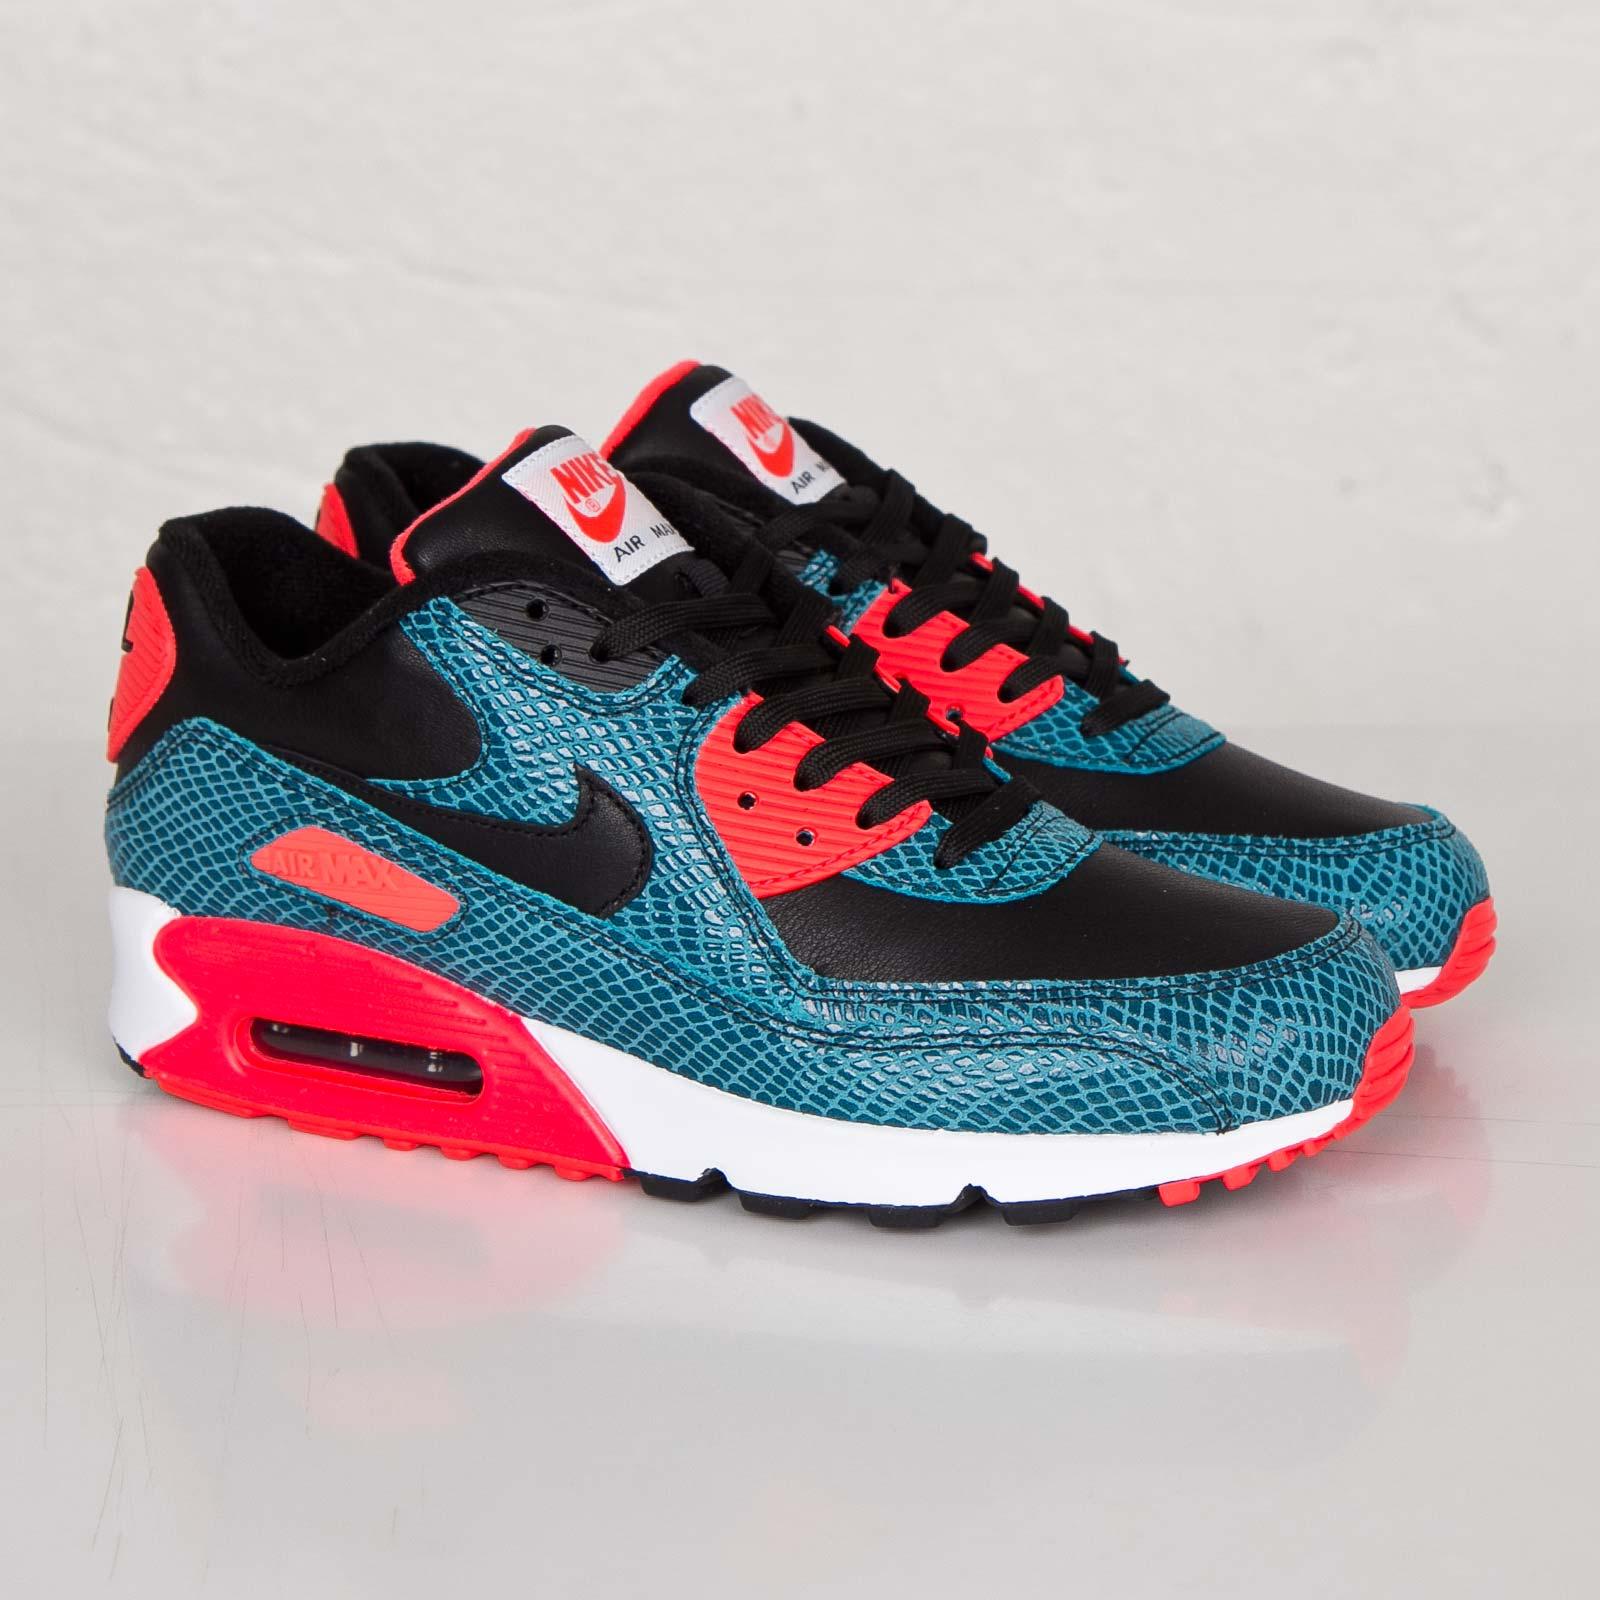 f18c40975fa1 Nike Air Max 90 Anniversary - 725235-300 - Sneakersnstuff